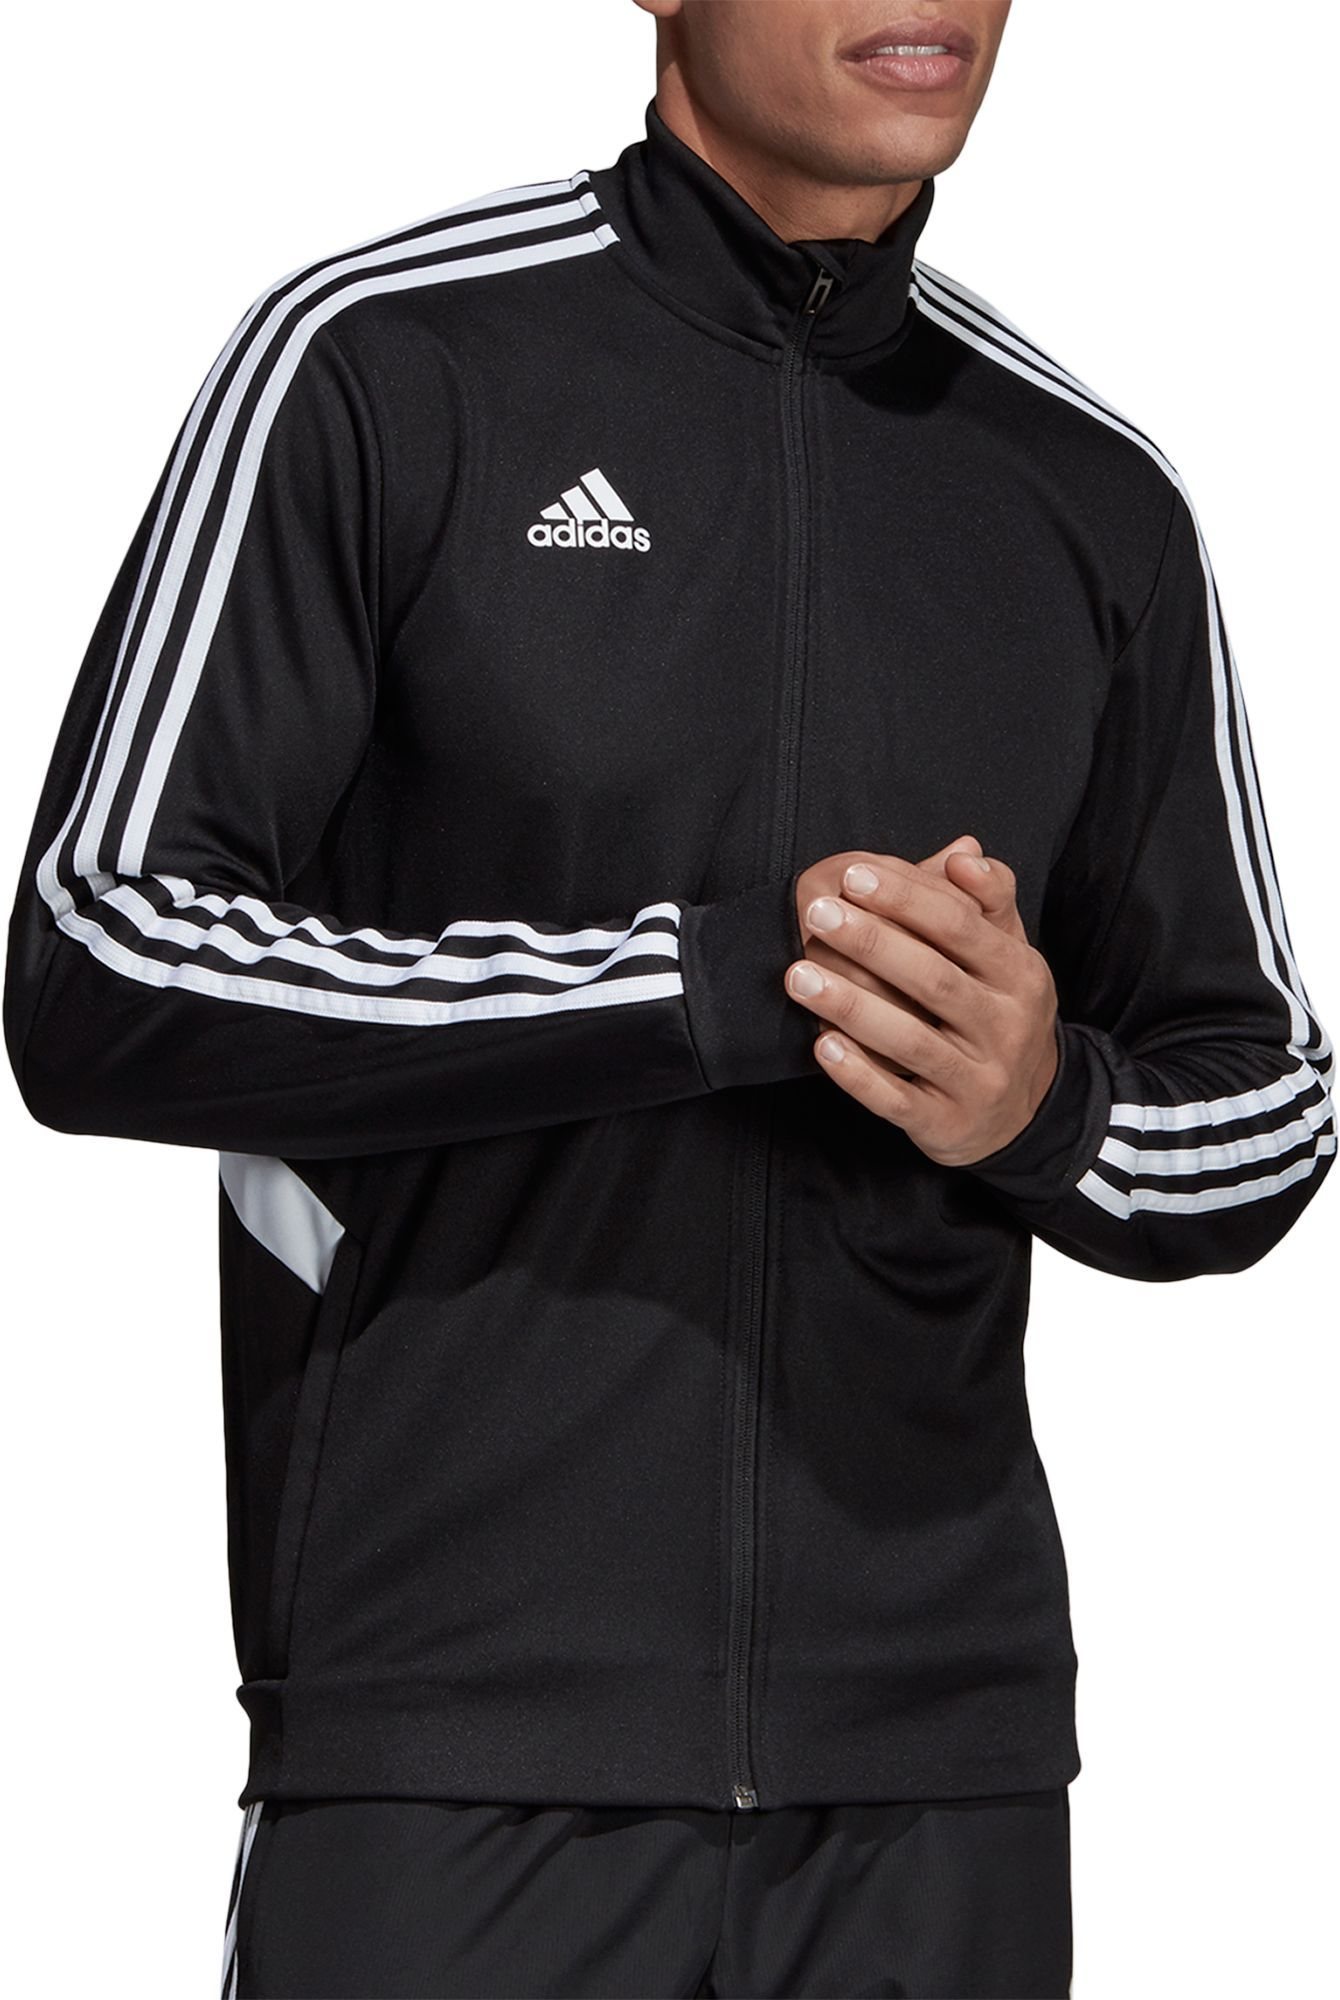 adidas Men's Tiro 19 Soccer Training Jacket, Size: Small